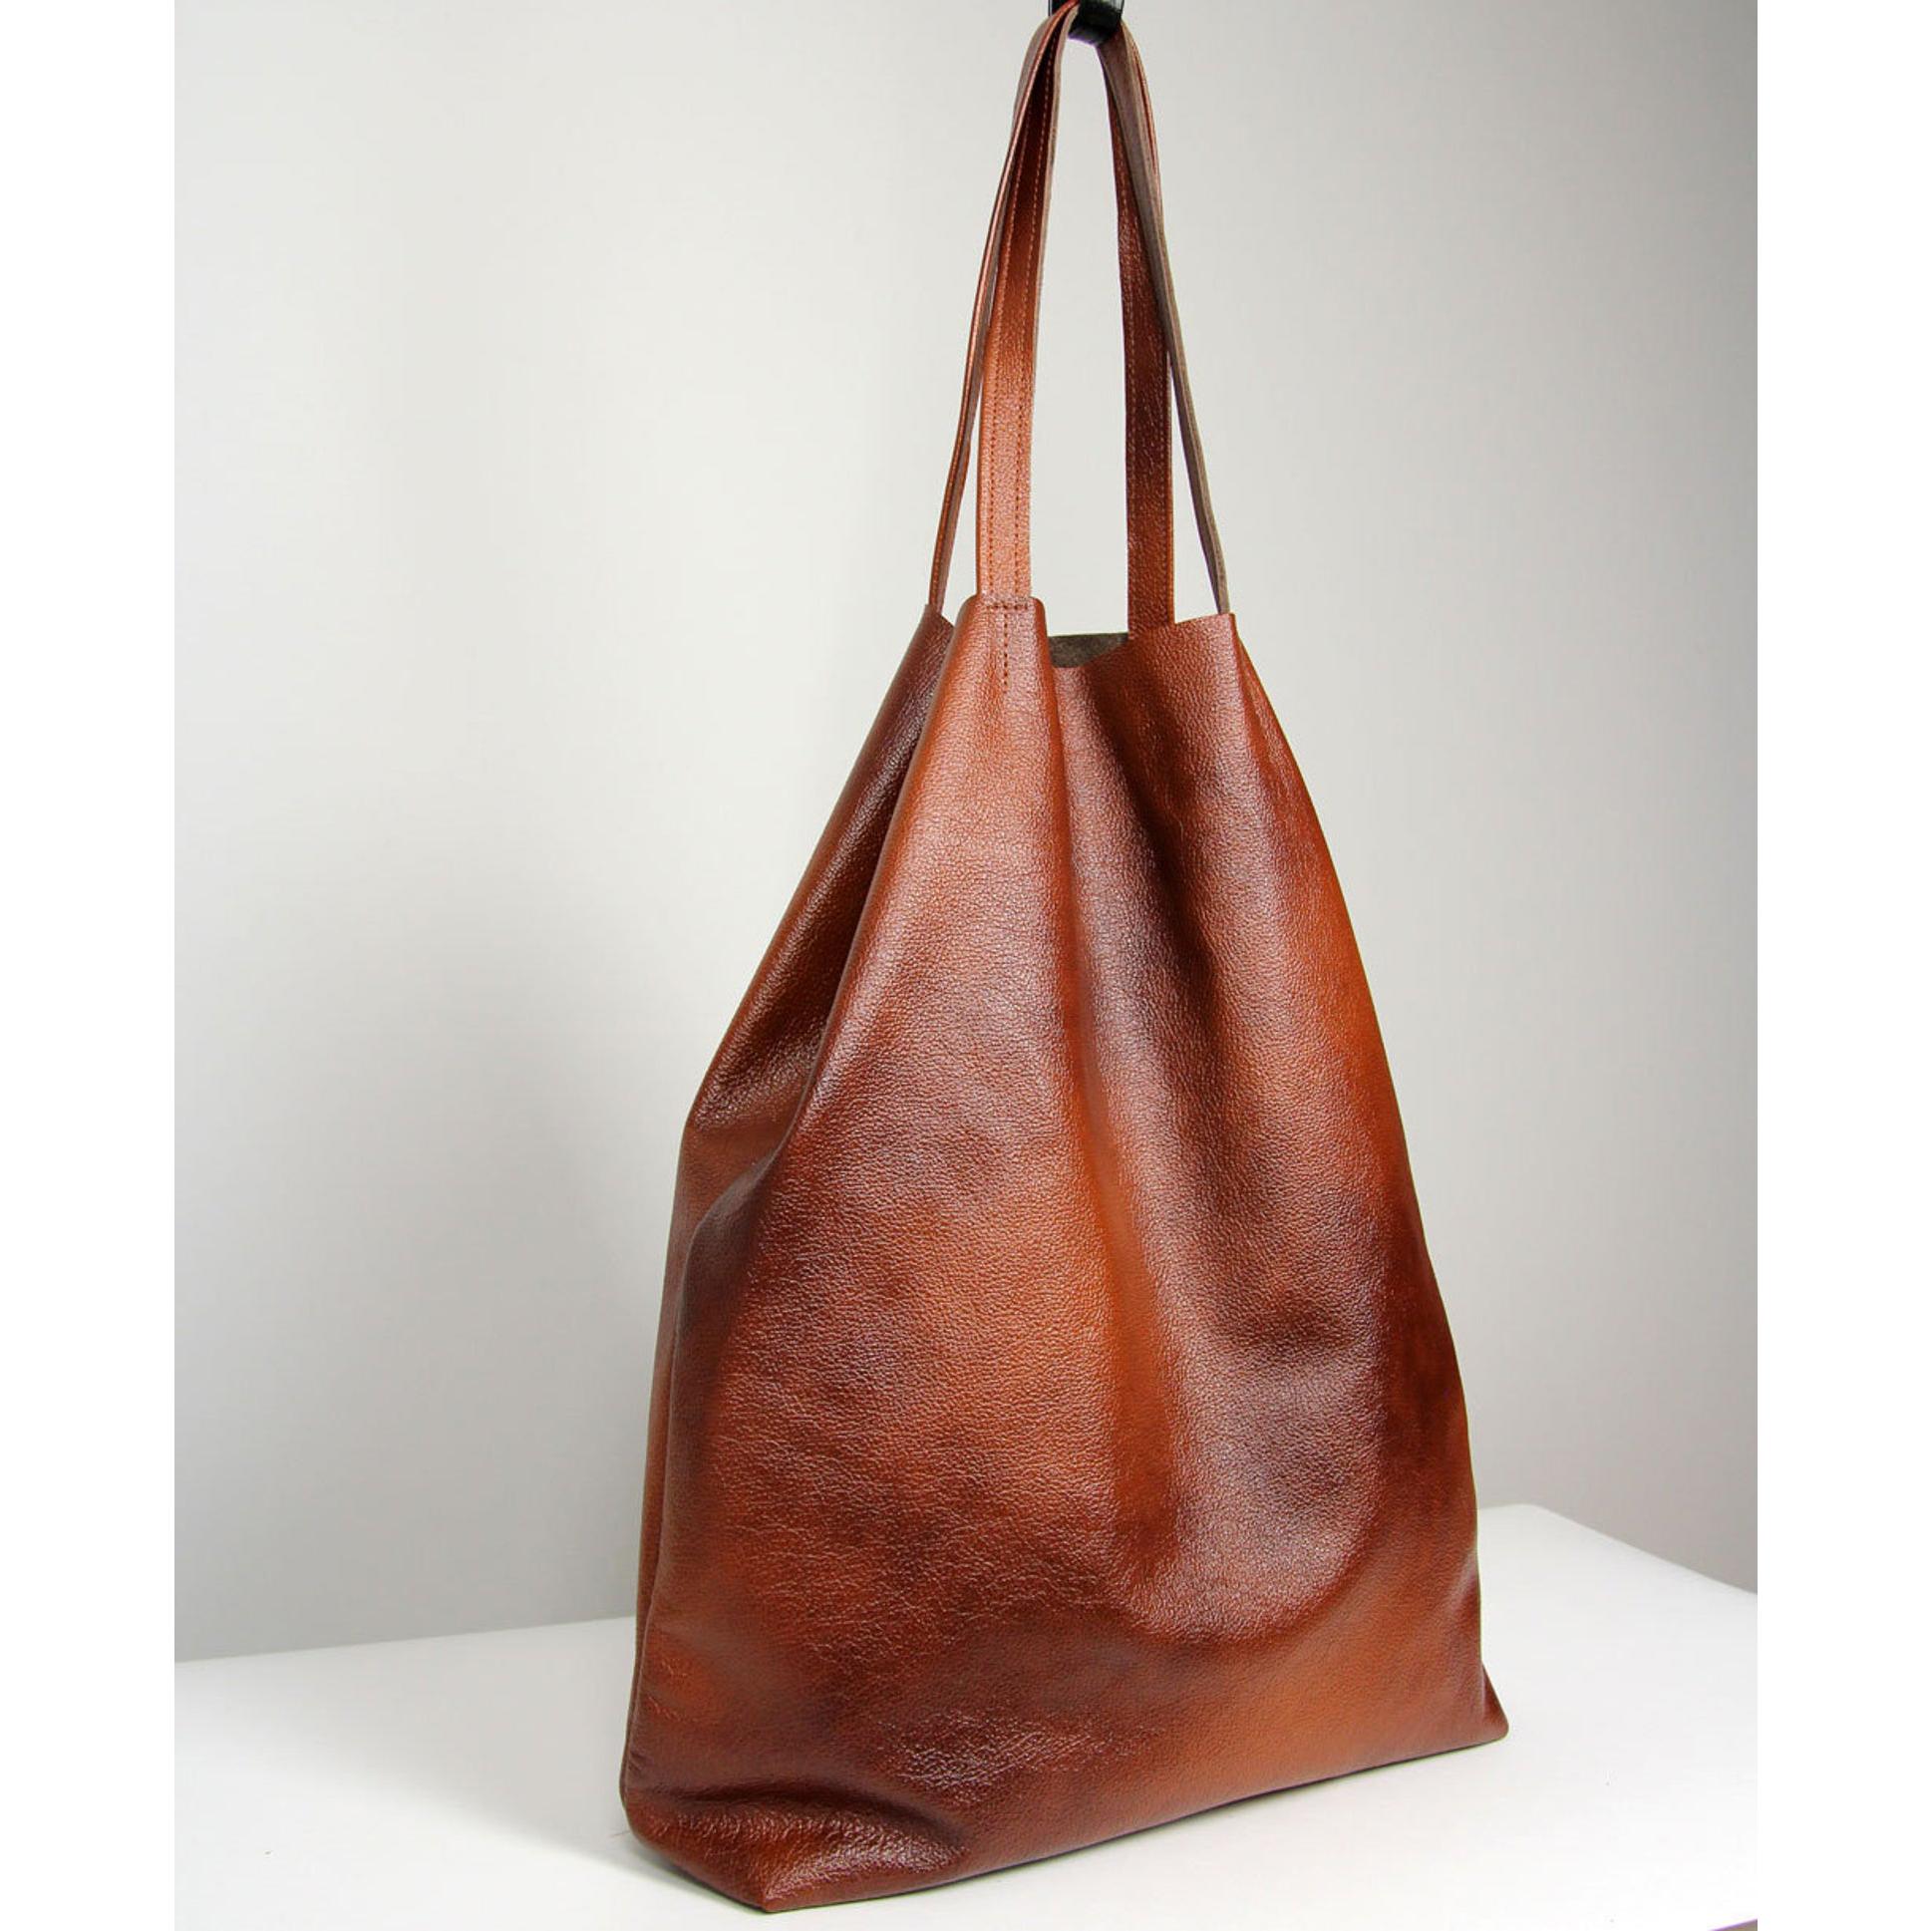 Color : Soil Yellow RLJJCS New Ladies Retro Shoulder Bag Solid Color Oil Wax Leather Messenger Bag Handbag Crossbody Bag